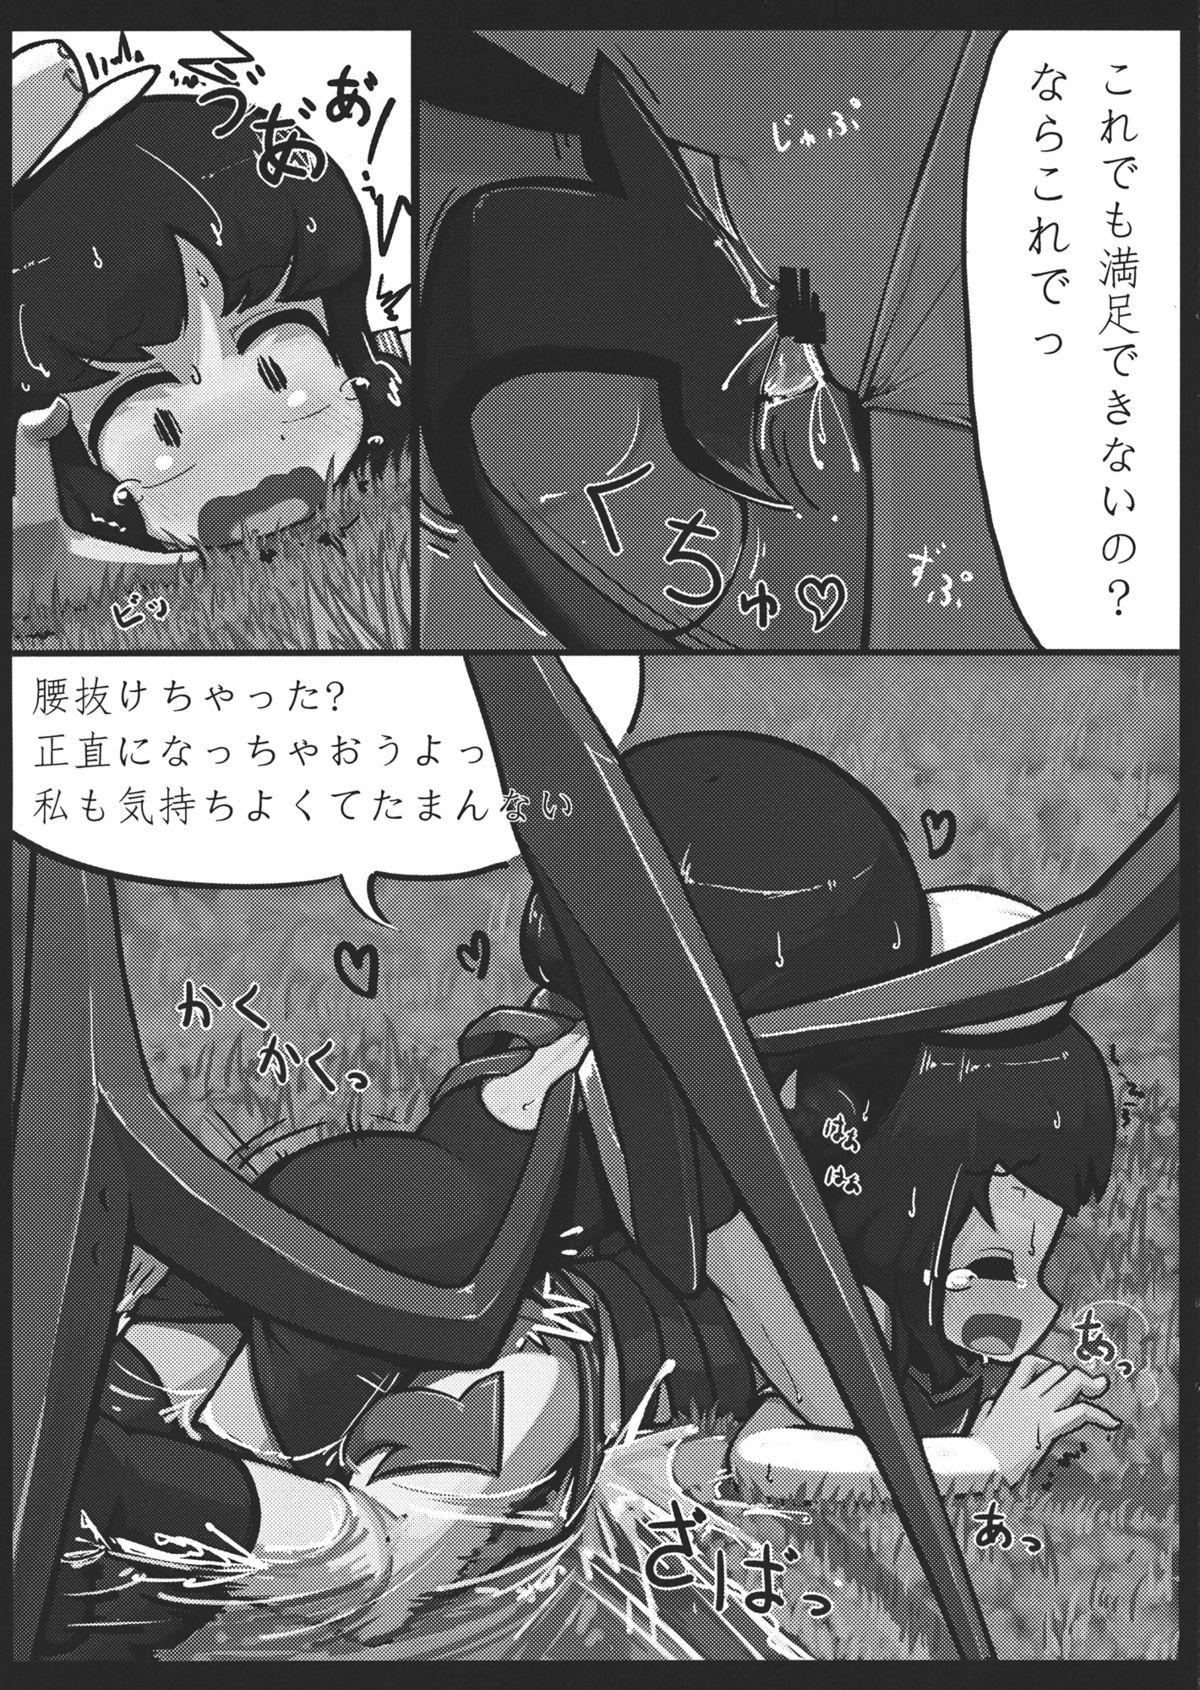 Nue x Murasa Shunga 16